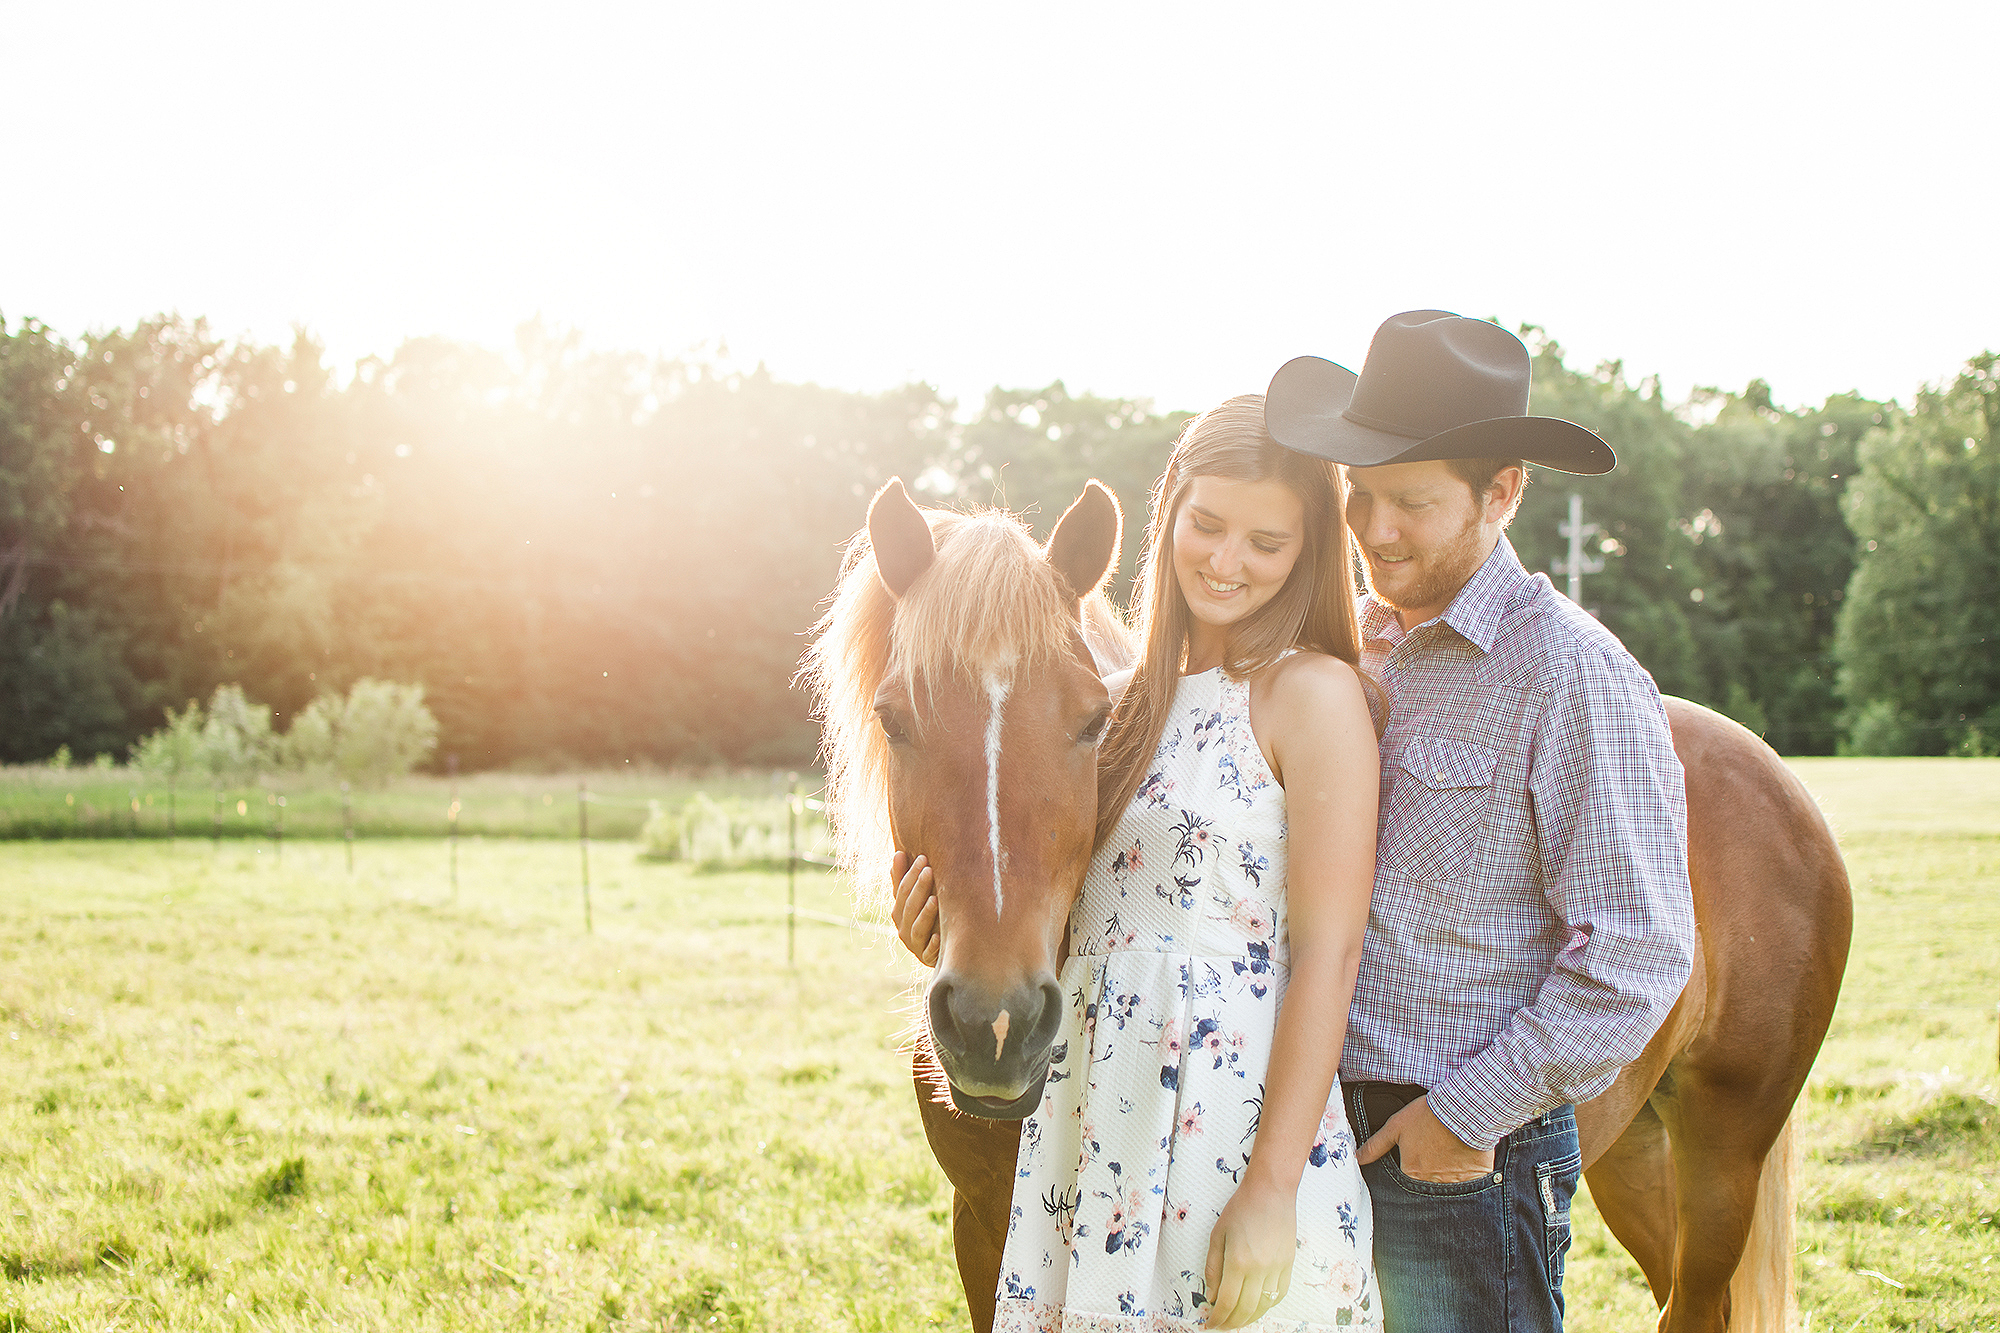 Lindsay-Adkins-Photography-Michigan-Wedding-Photographer-Luke-Shelby-4